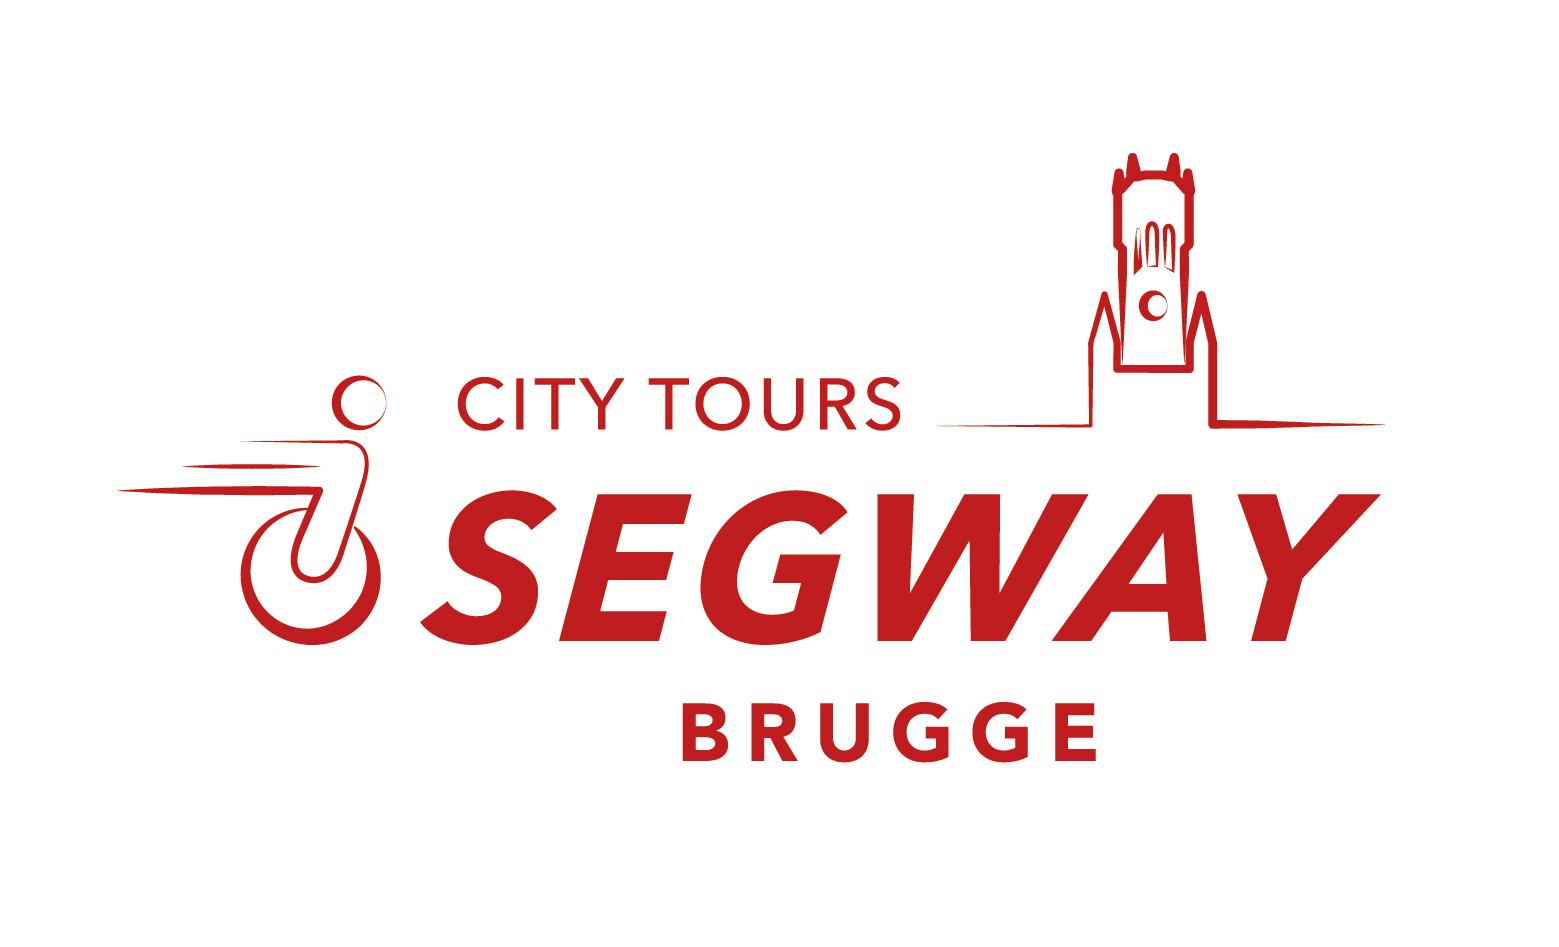 Segway Brugge